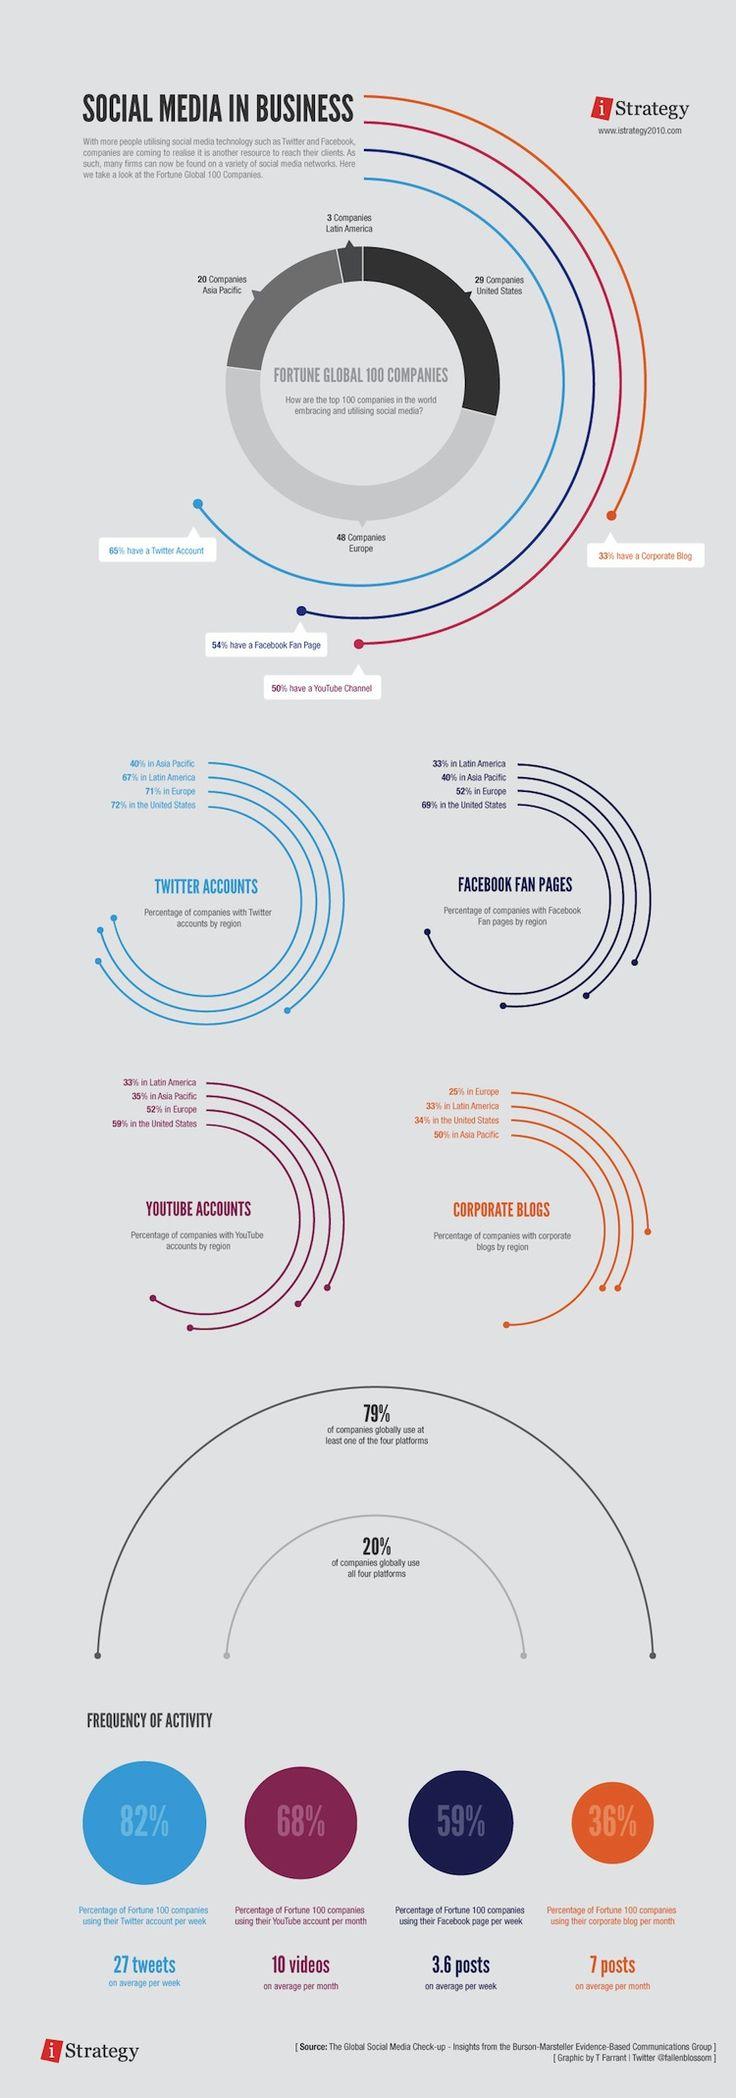 Infographic: Fortune 100 Companies Jump on Social-Media Bandwagon   Co.Design: business + innovation + design